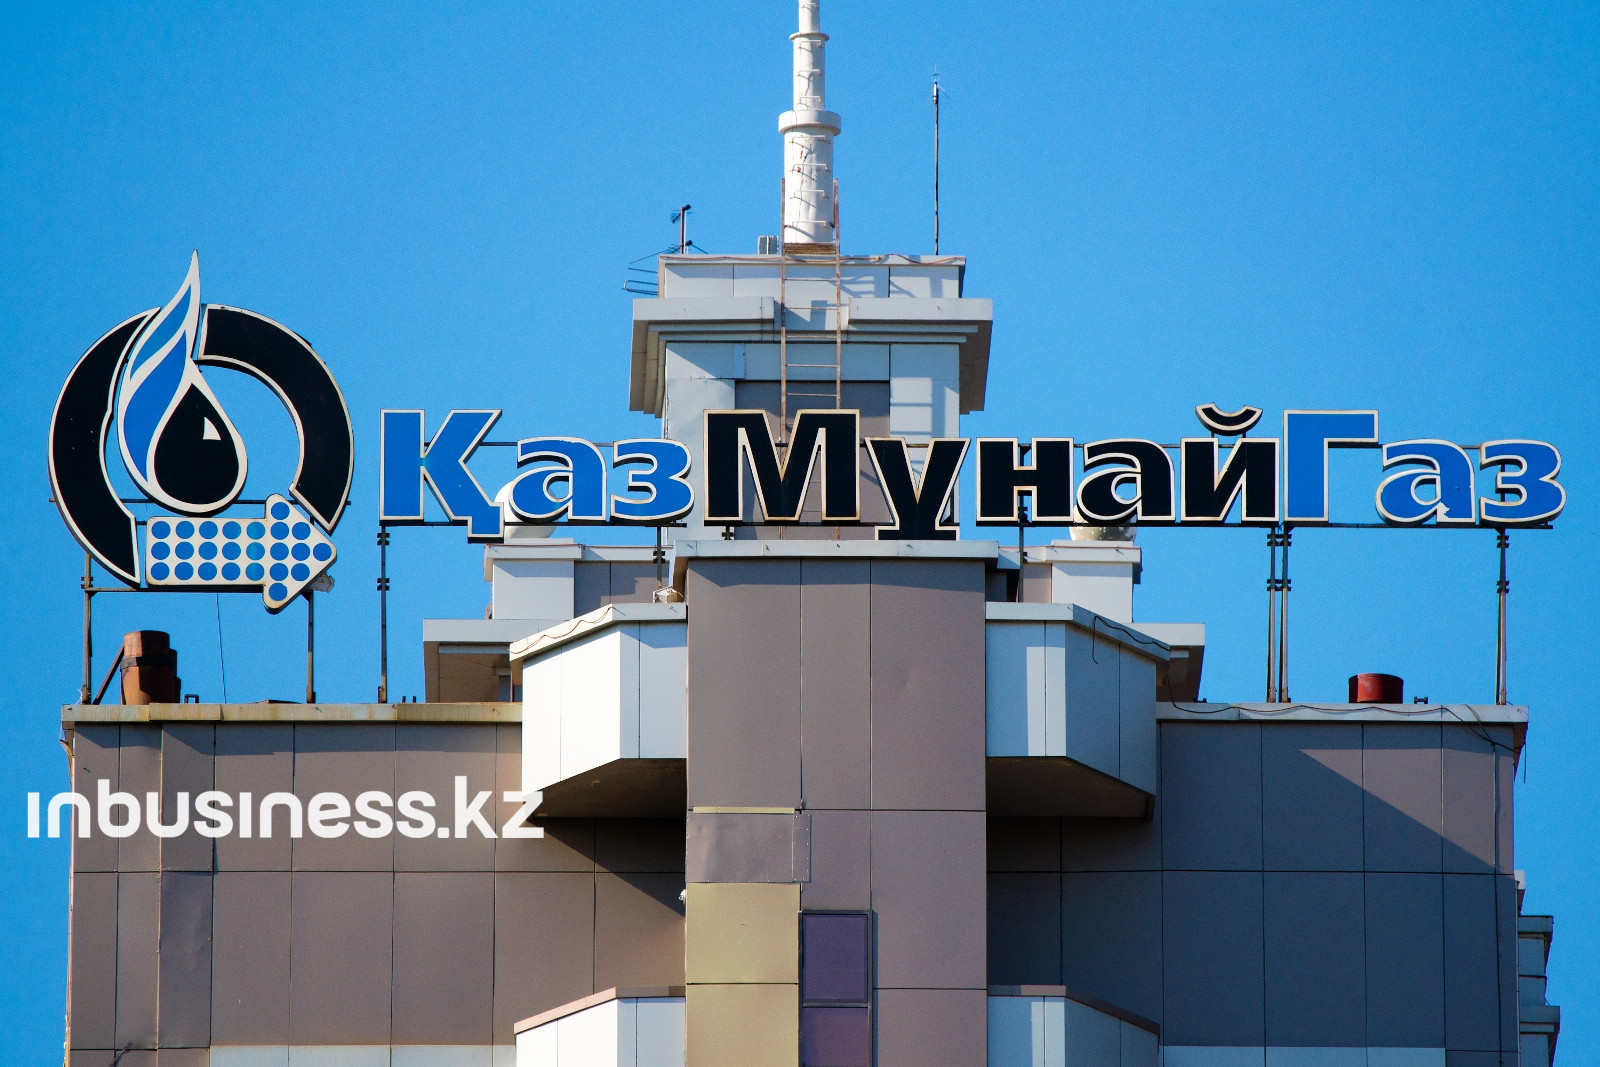 В «КазМунайГазе» случаев коронавируса среди сотрудников нет